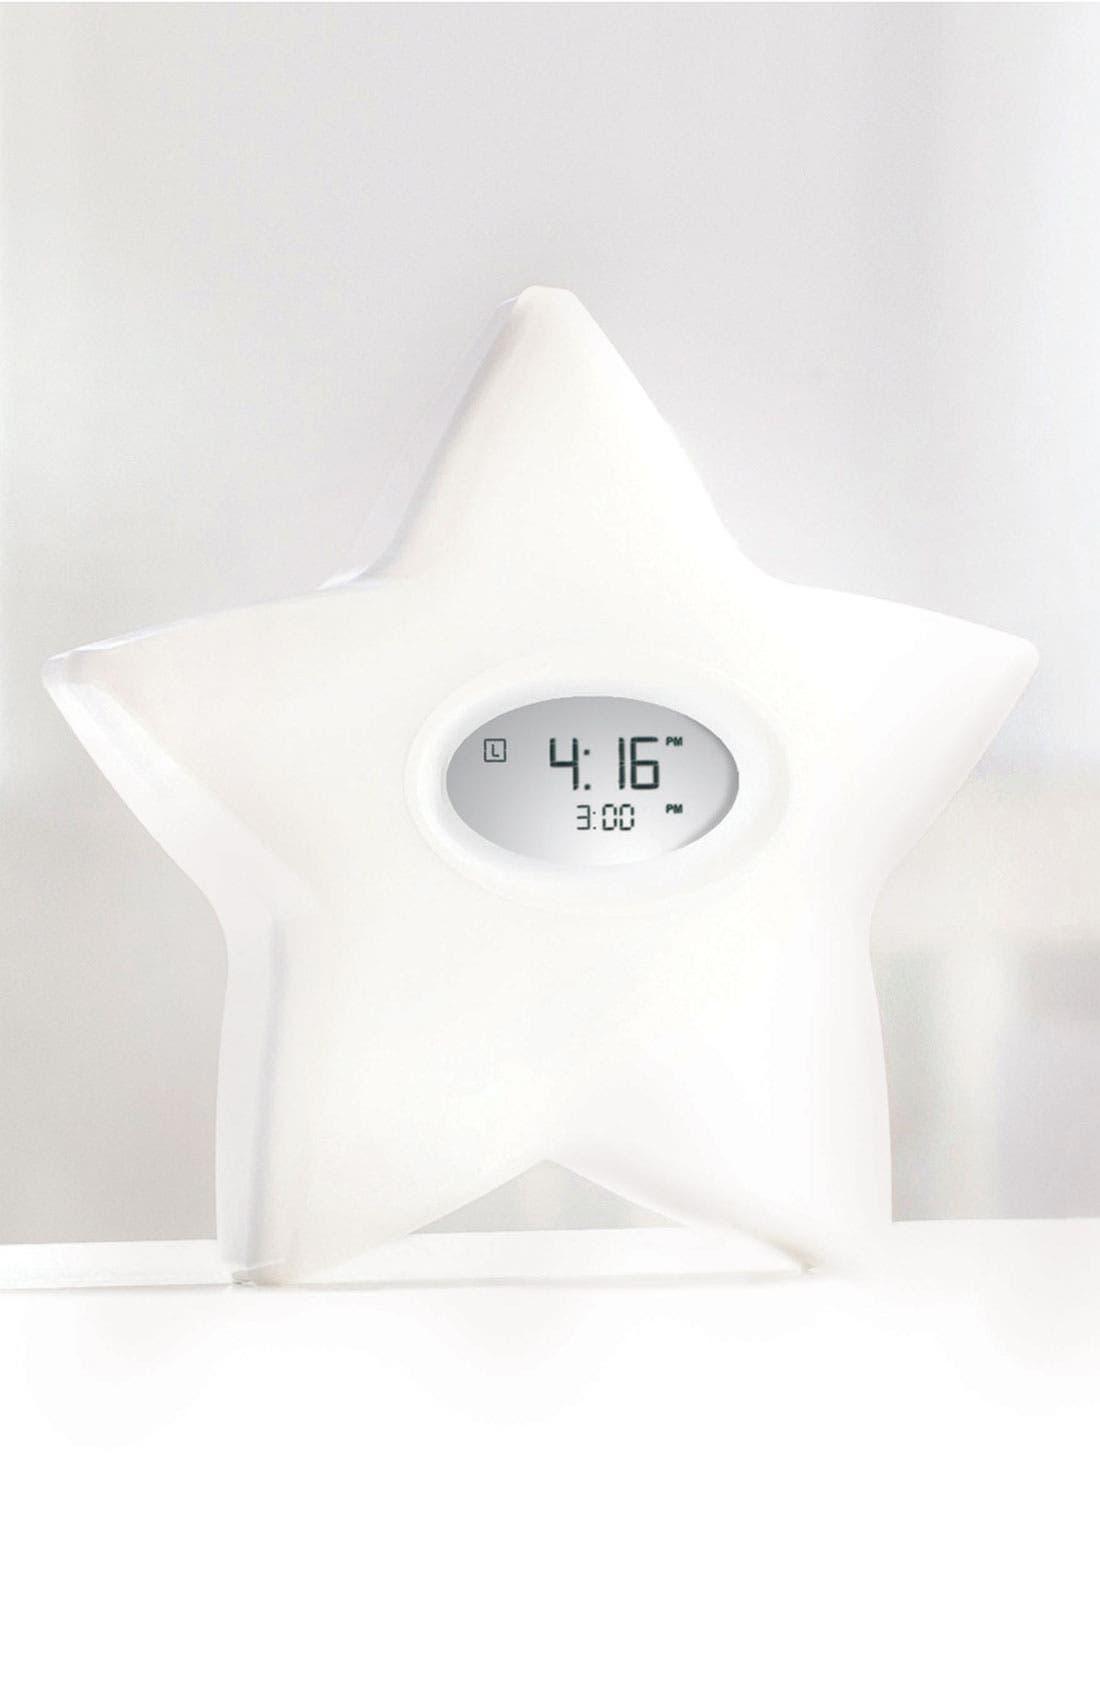 ADEN + ANAIS 'Serenity Star<sup>™</sup>' Electronic Feeding & Sleep System, Main, color, 100